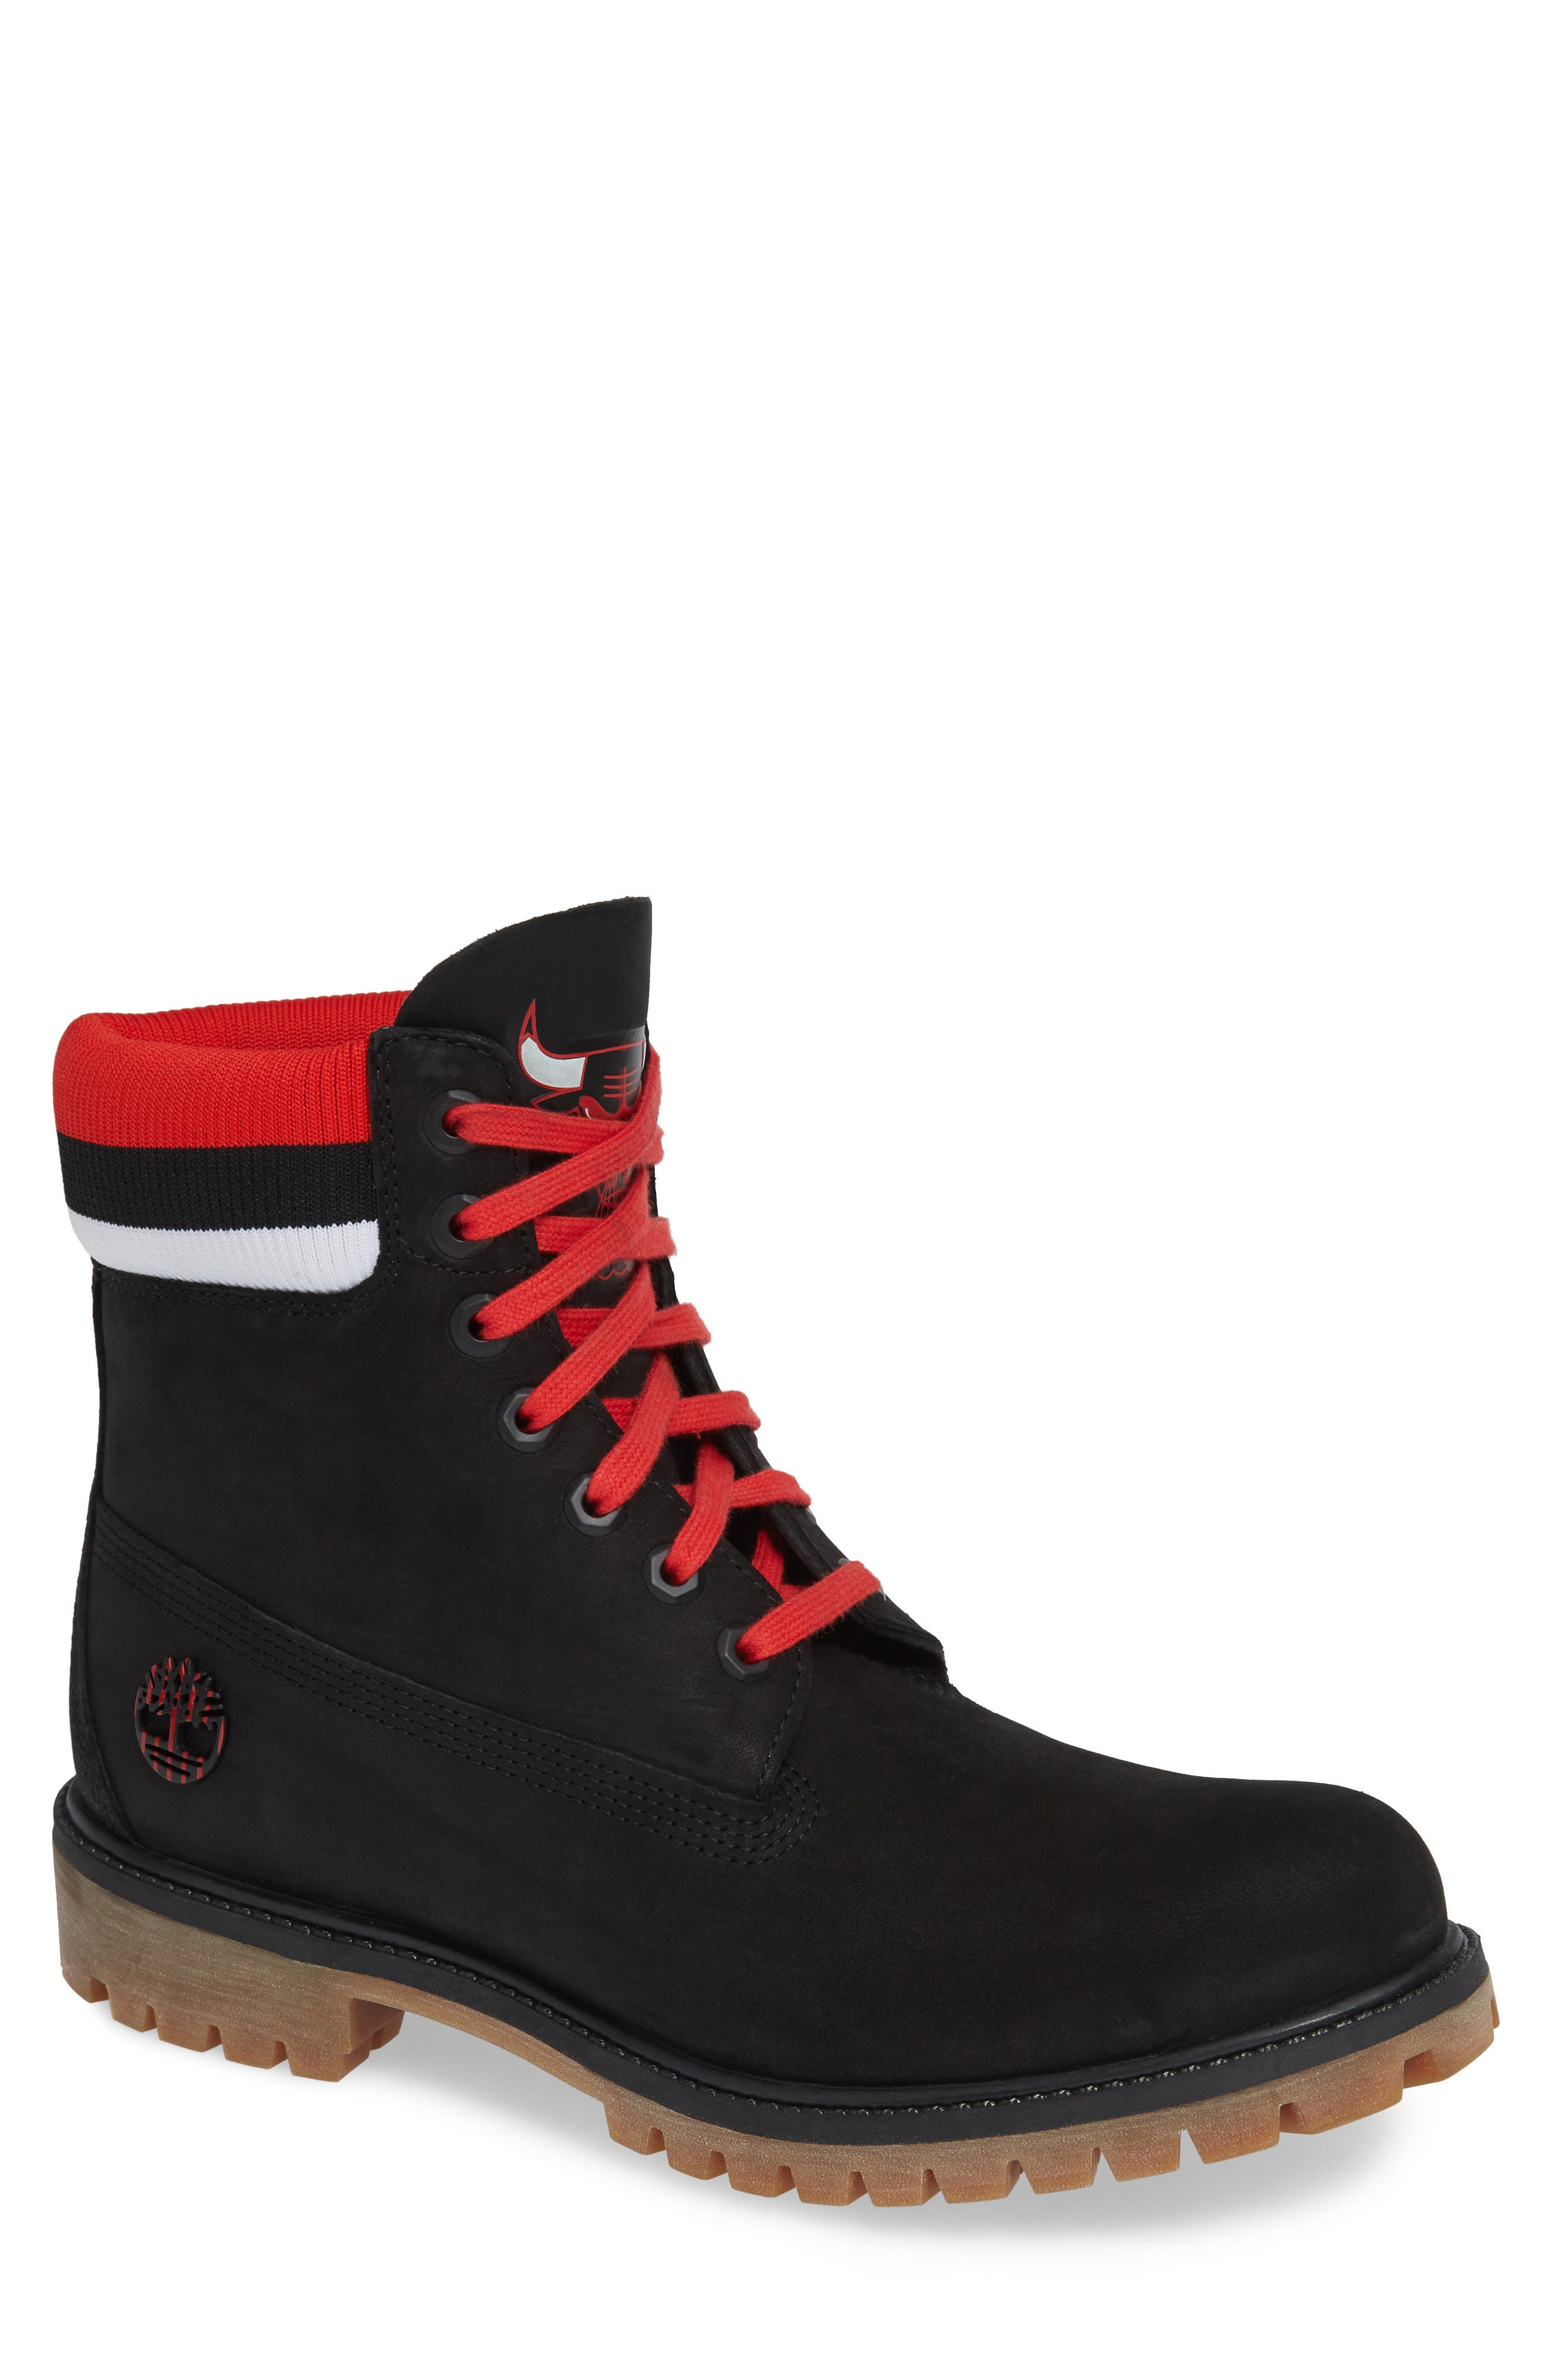 Timberland Premium Nba Collection Boot, Black